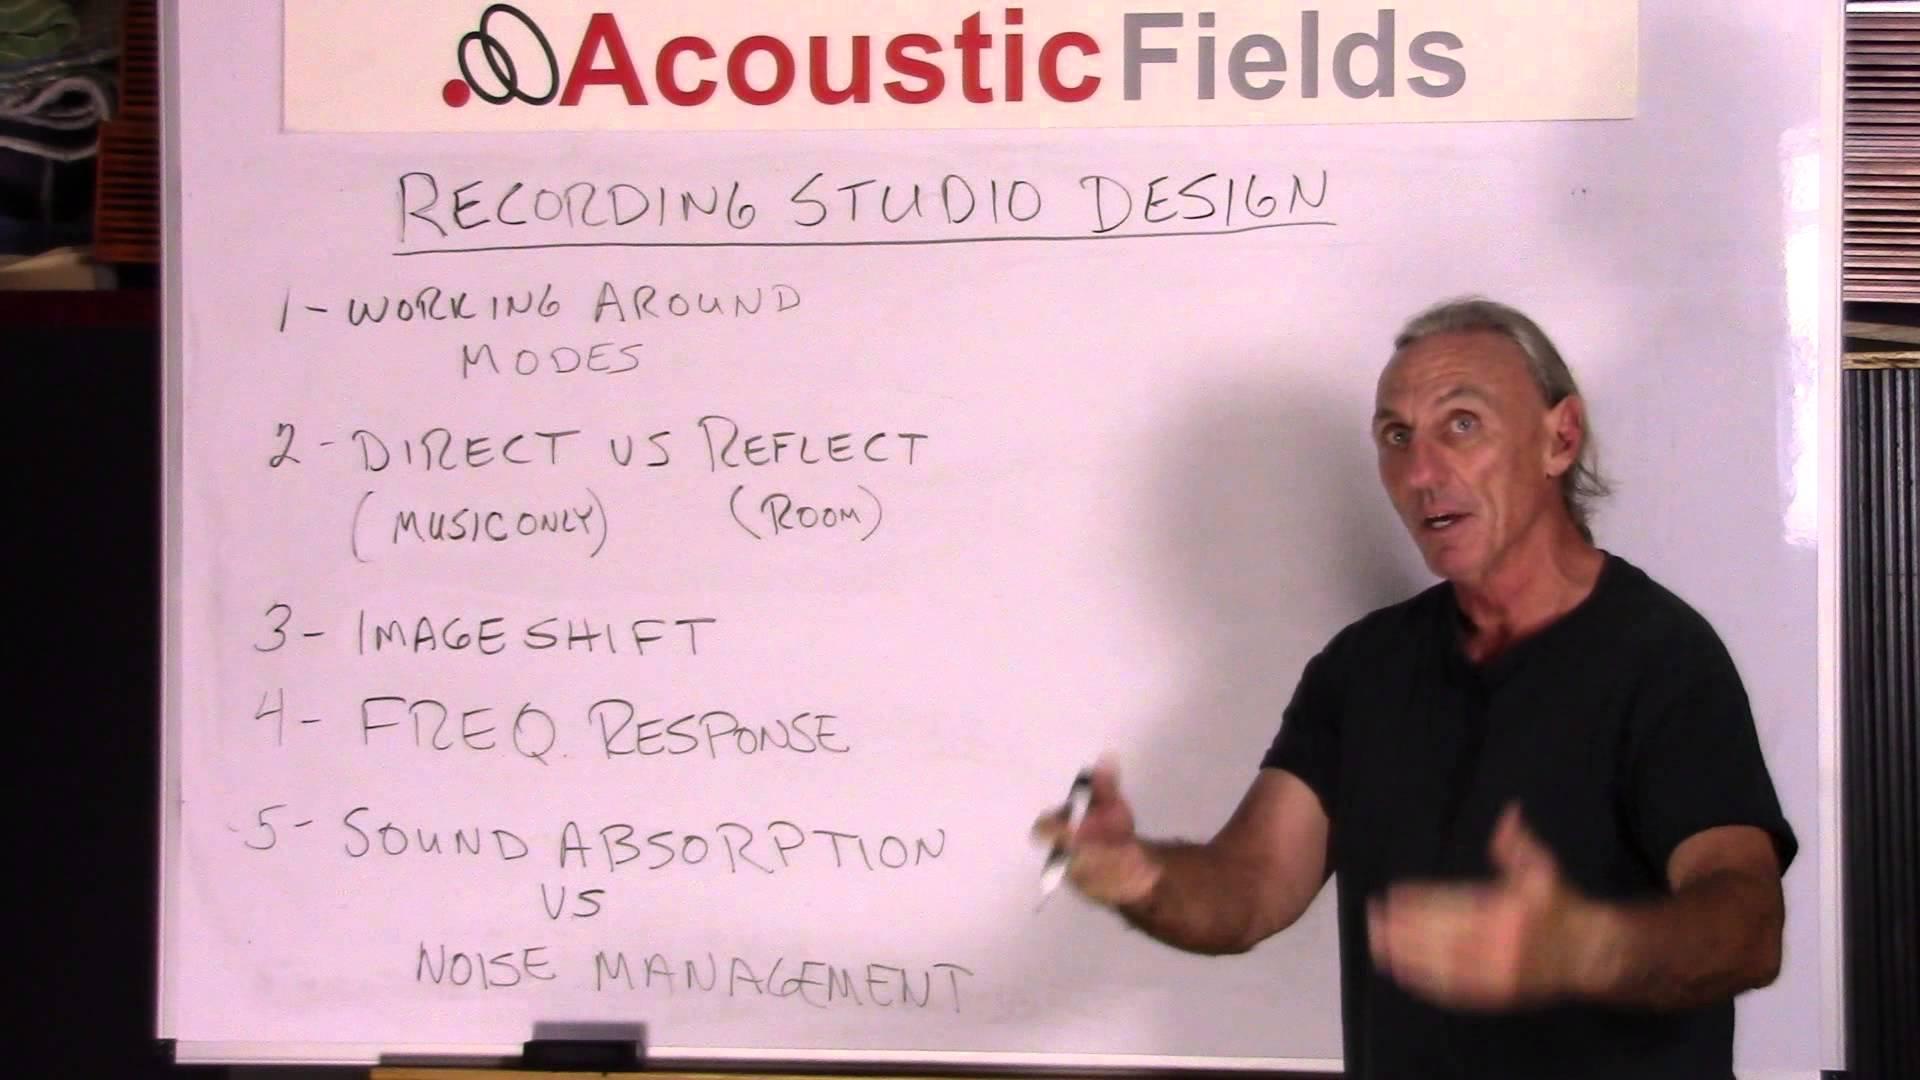 Top 7 Recording Studio Design Principles Explained